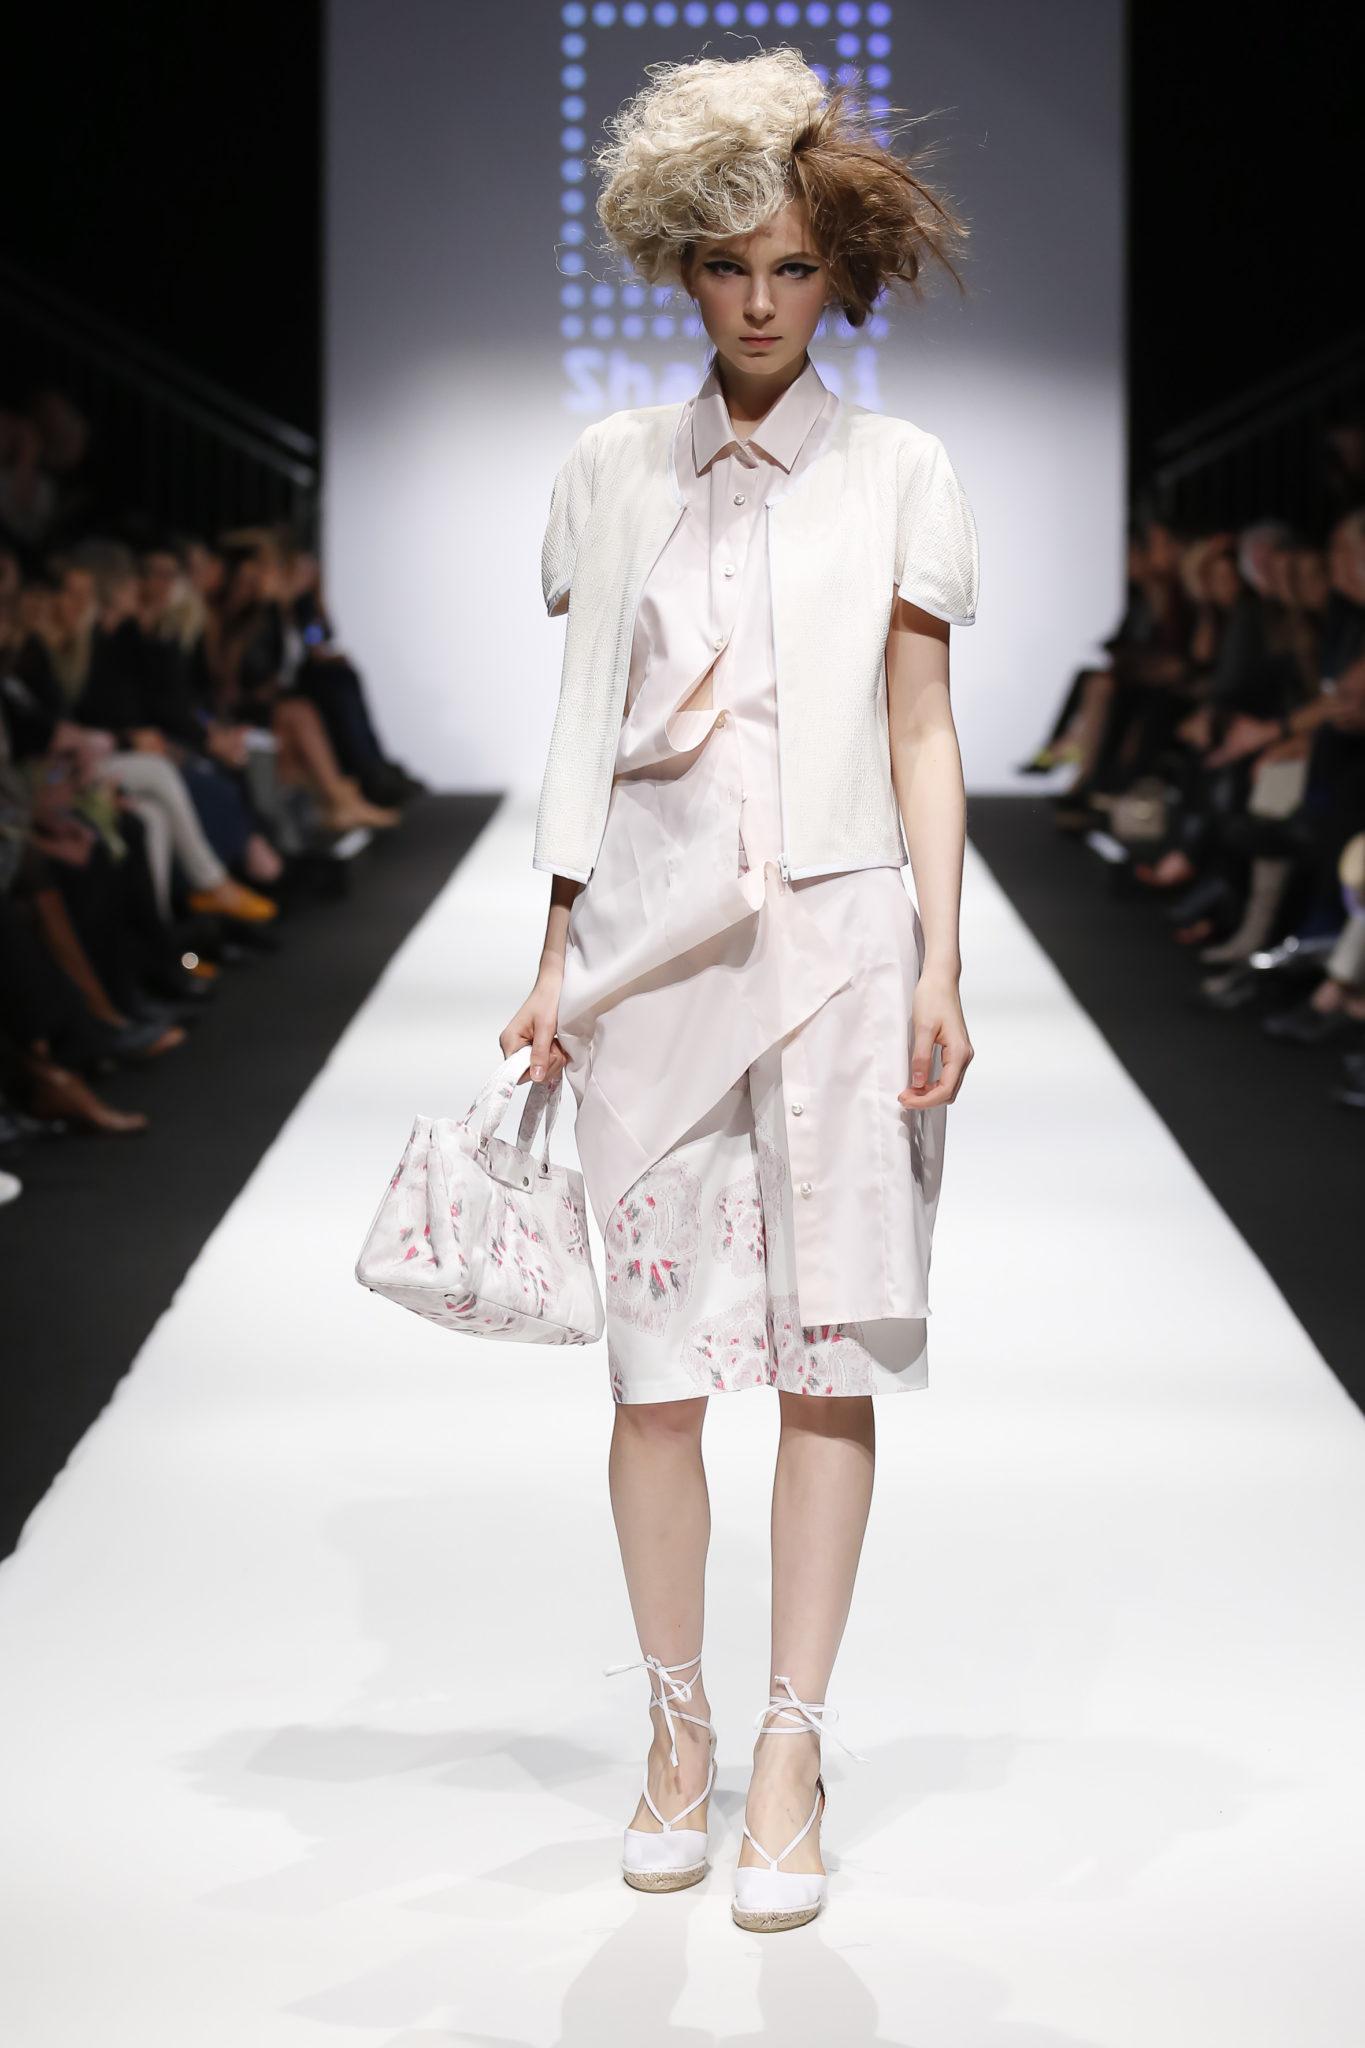 Designer: Shakkei, unknown model